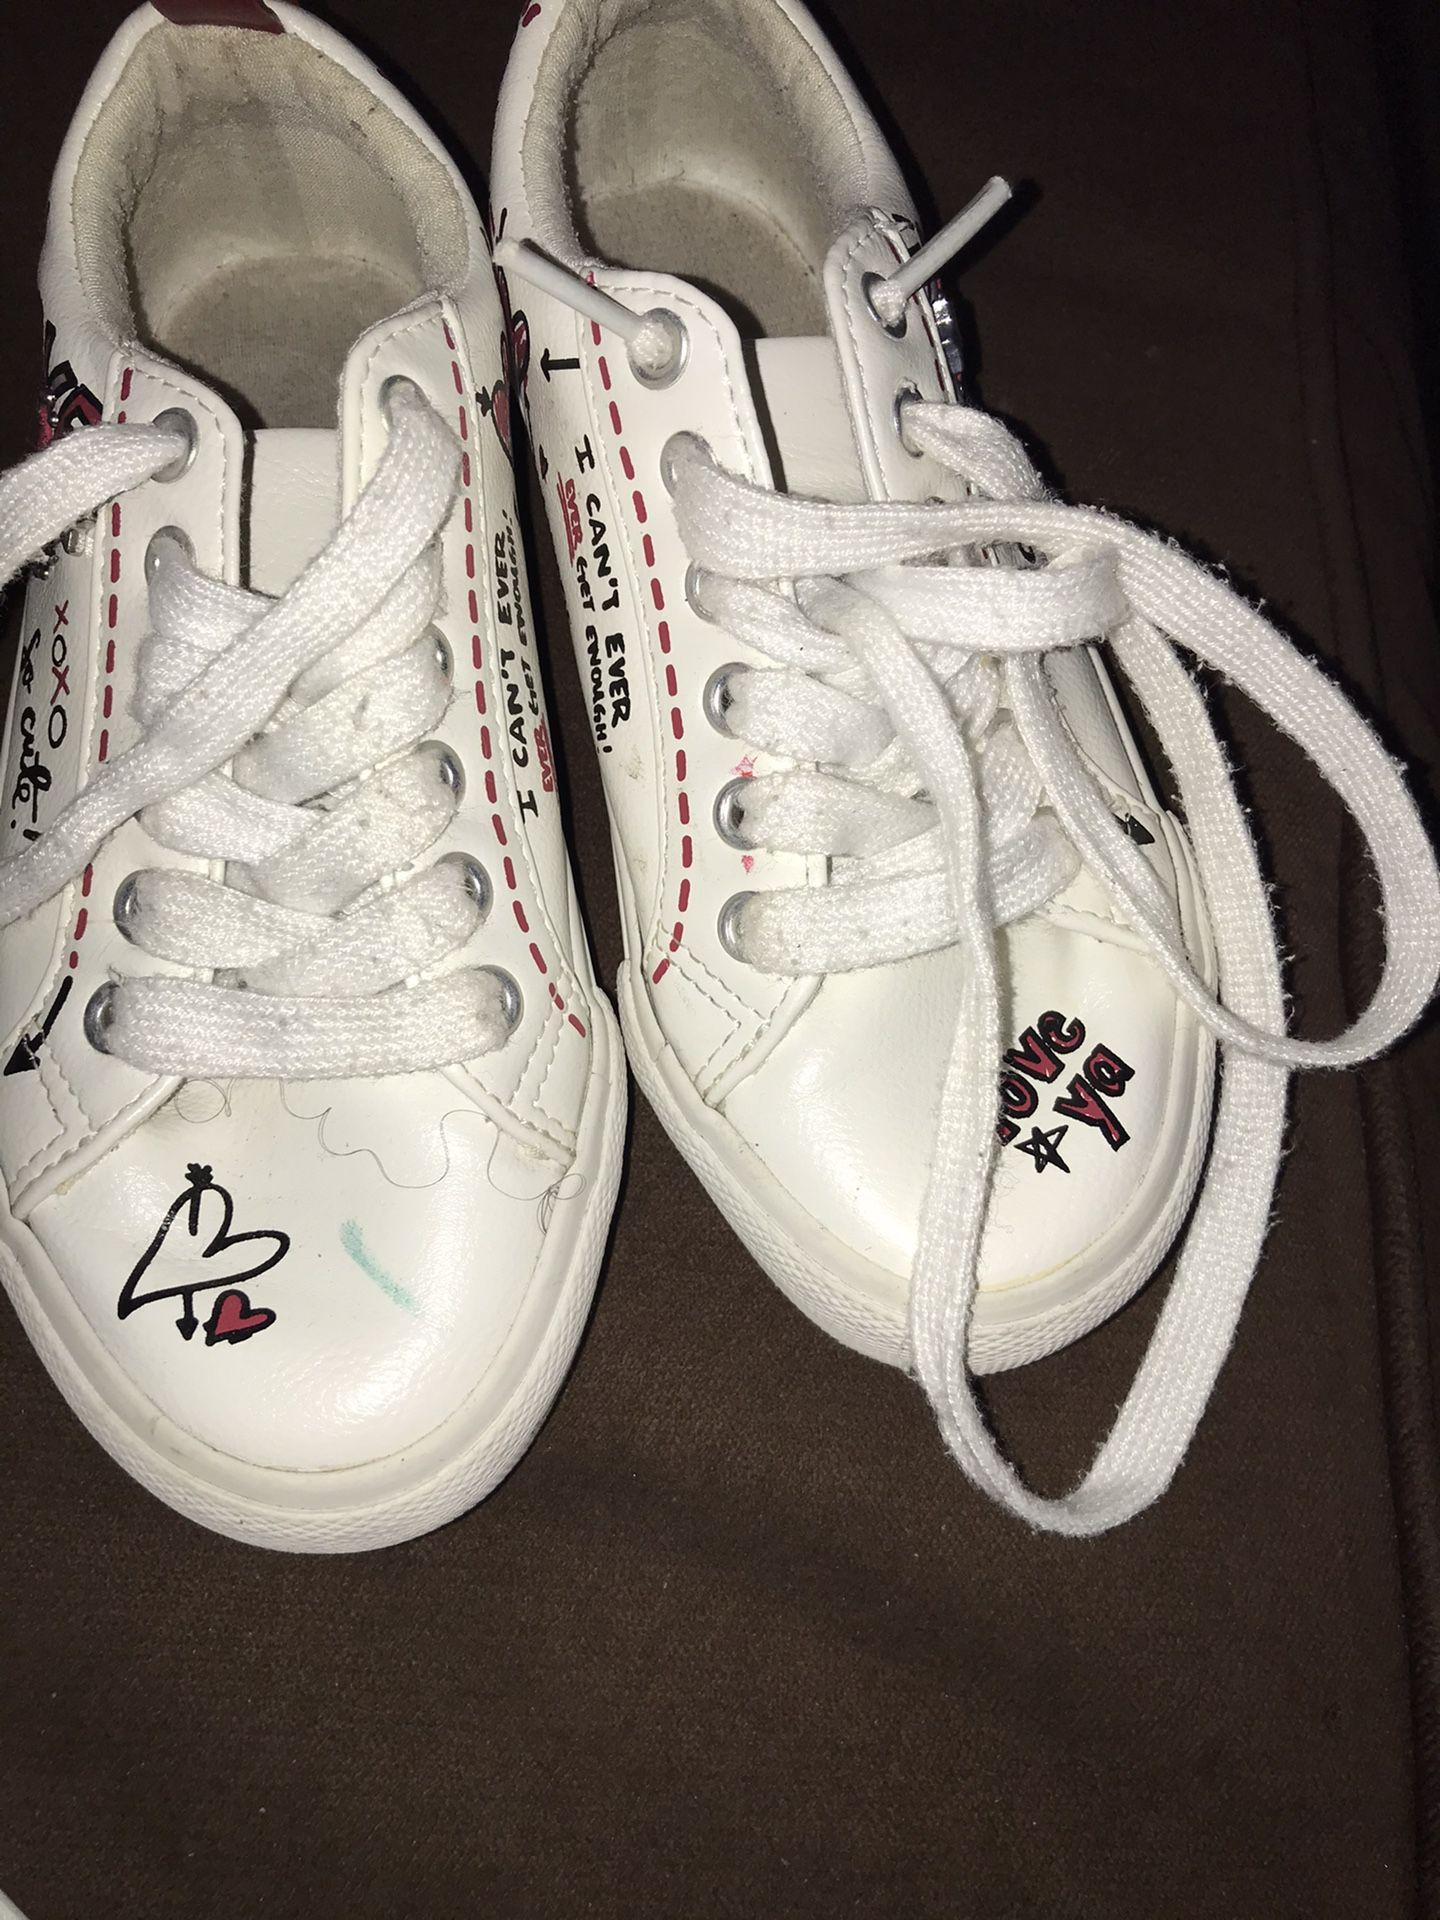 Aldo Rain Boots And self Love Tennis Little Girl Size 12